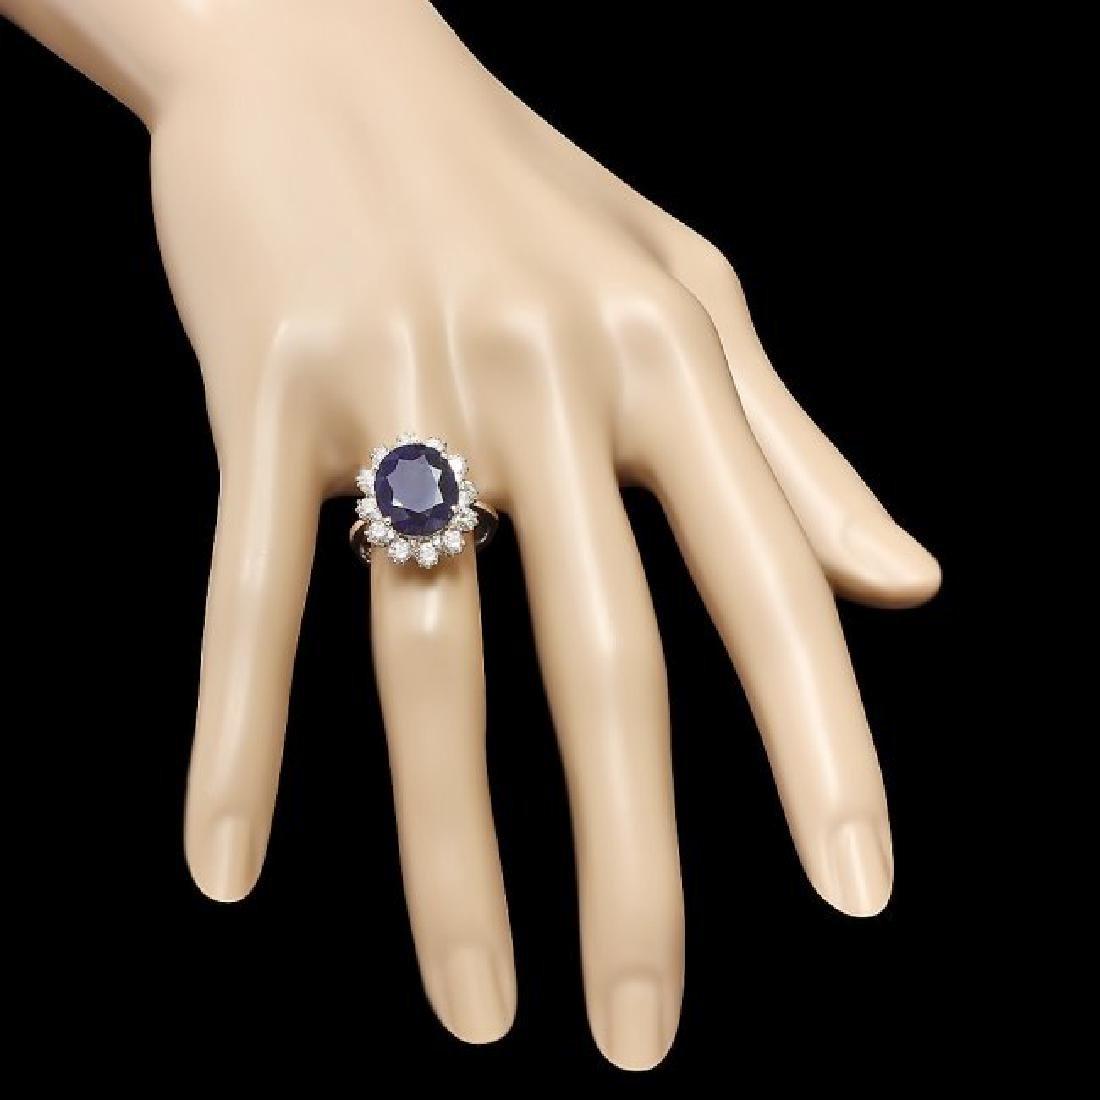 14k Gold 7.40ct Sapphire 1.18ct Diamond Ring - 3